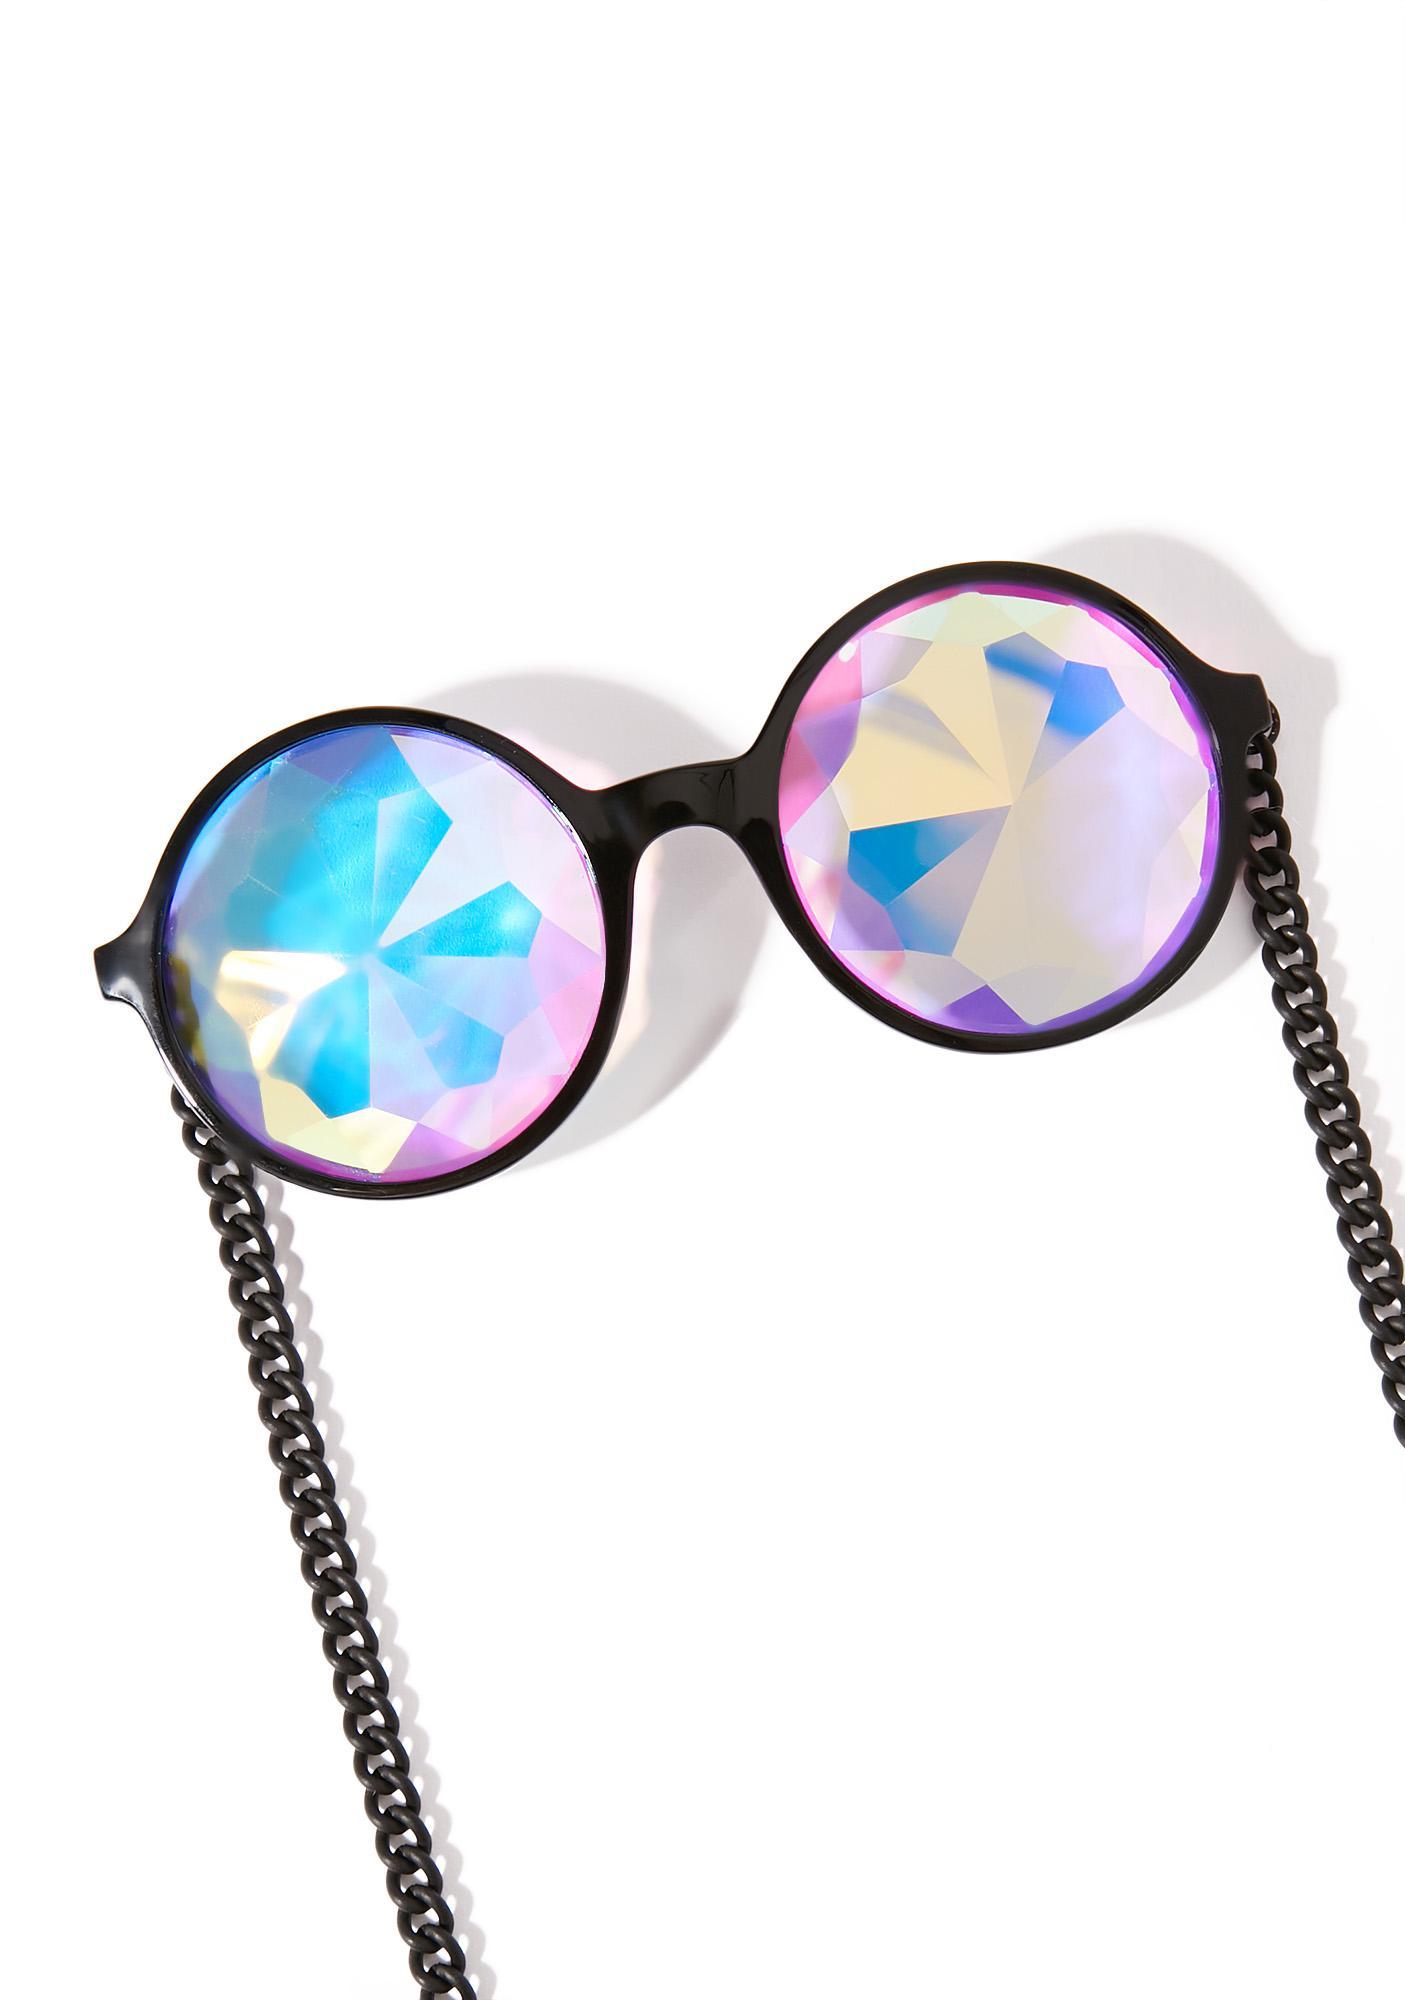 558045caa0 ... My Willows Mosaic Kaleidoscope Chain Glasses ...